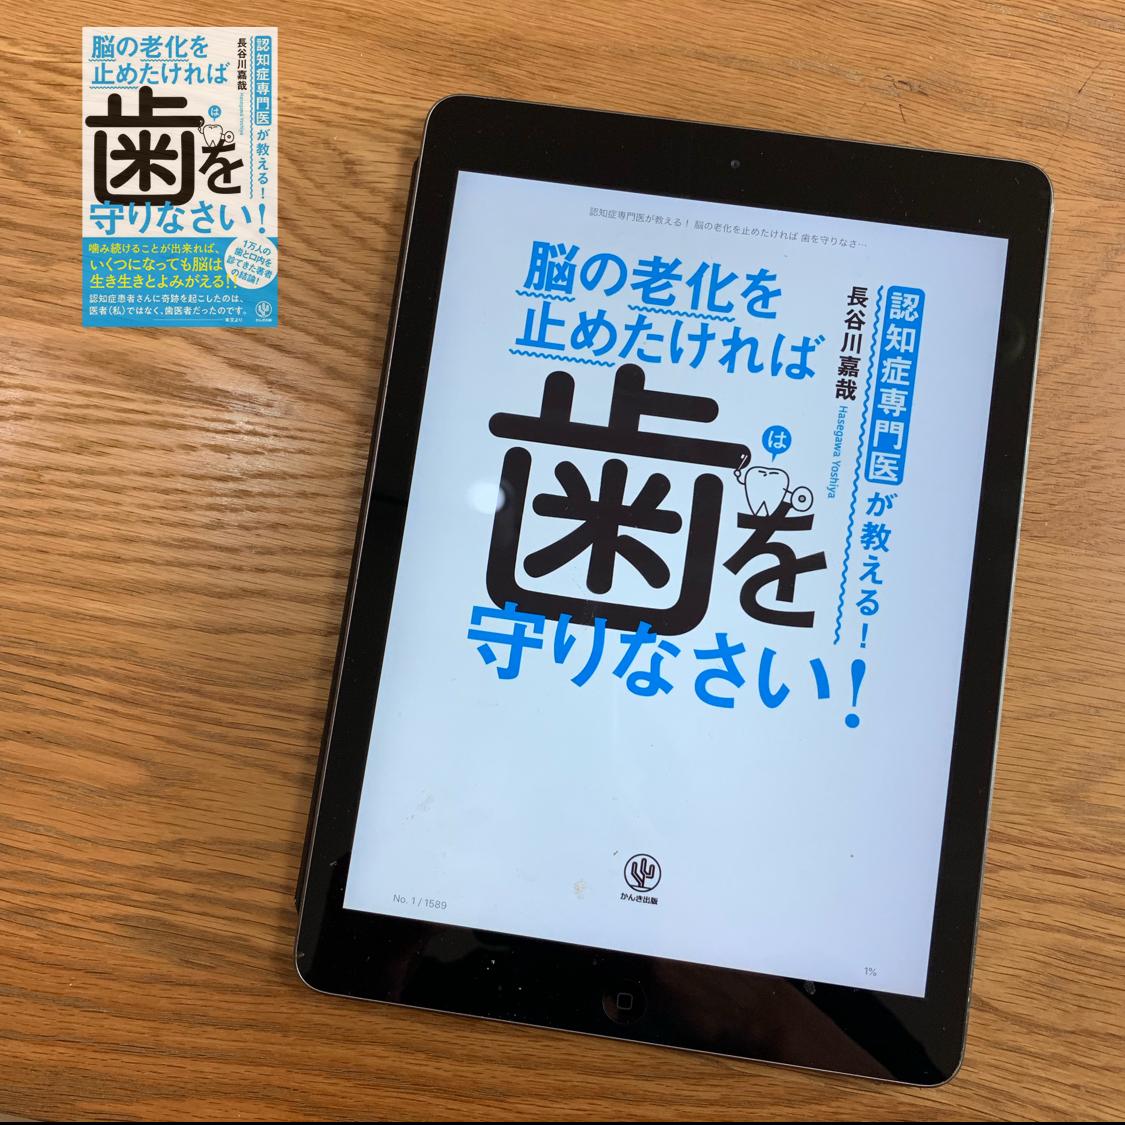 Amazon.co.jp: 認知症専門医が教える! 脳の老化を止めたければ 歯を守りなさい! eBook: 長谷川嘉哉: Kindleストア